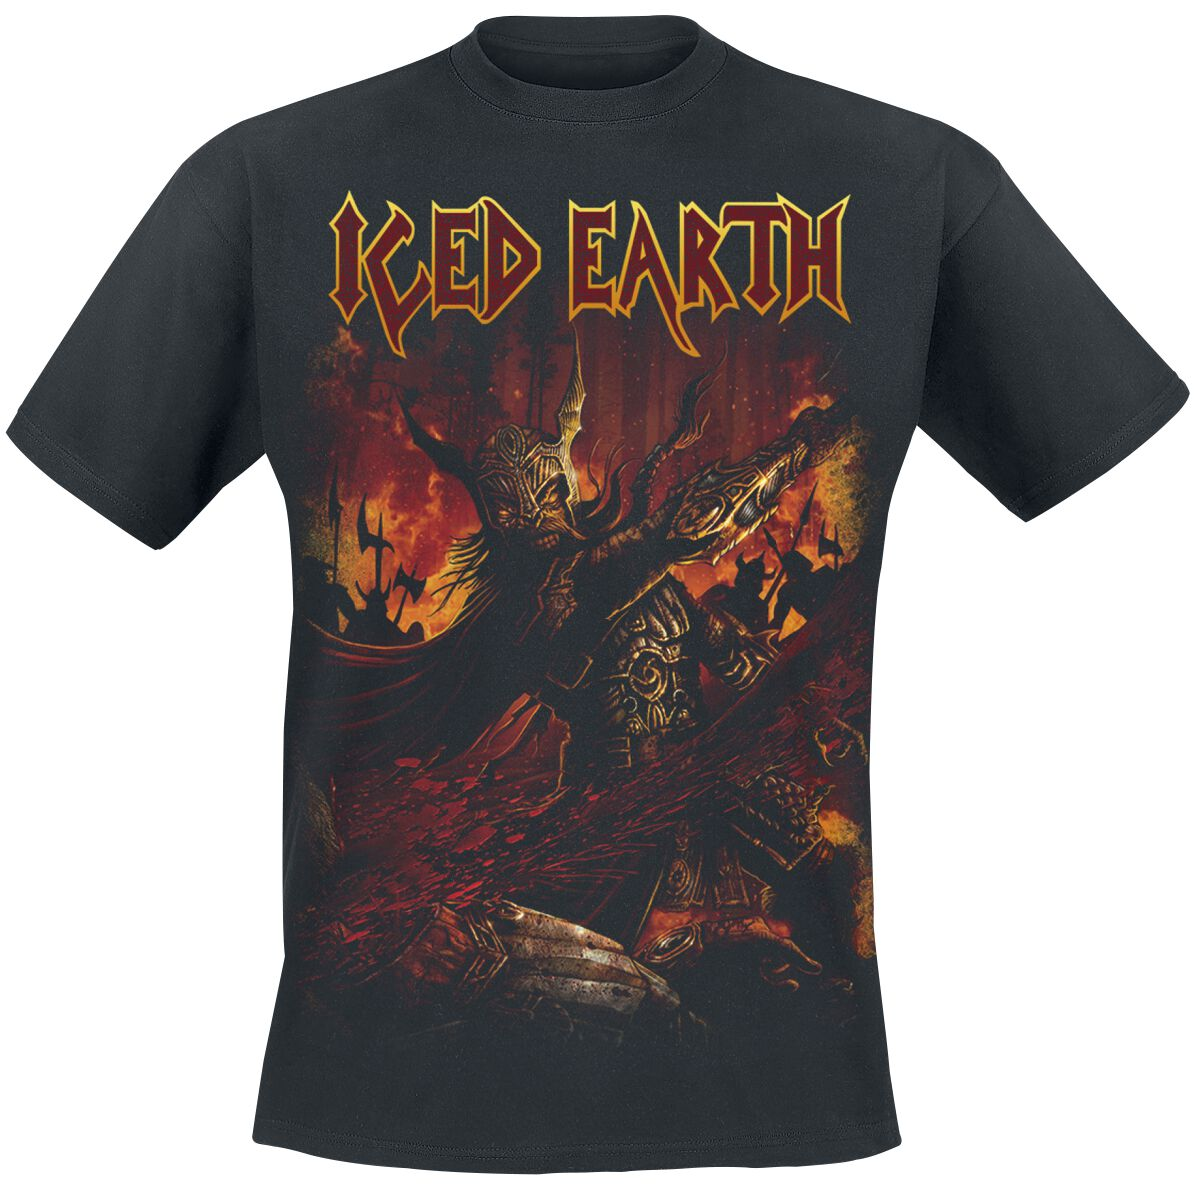 Zespoły - Koszulki - T-Shirt Iced Earth The great heathen army T-Shirt czarny - 373529